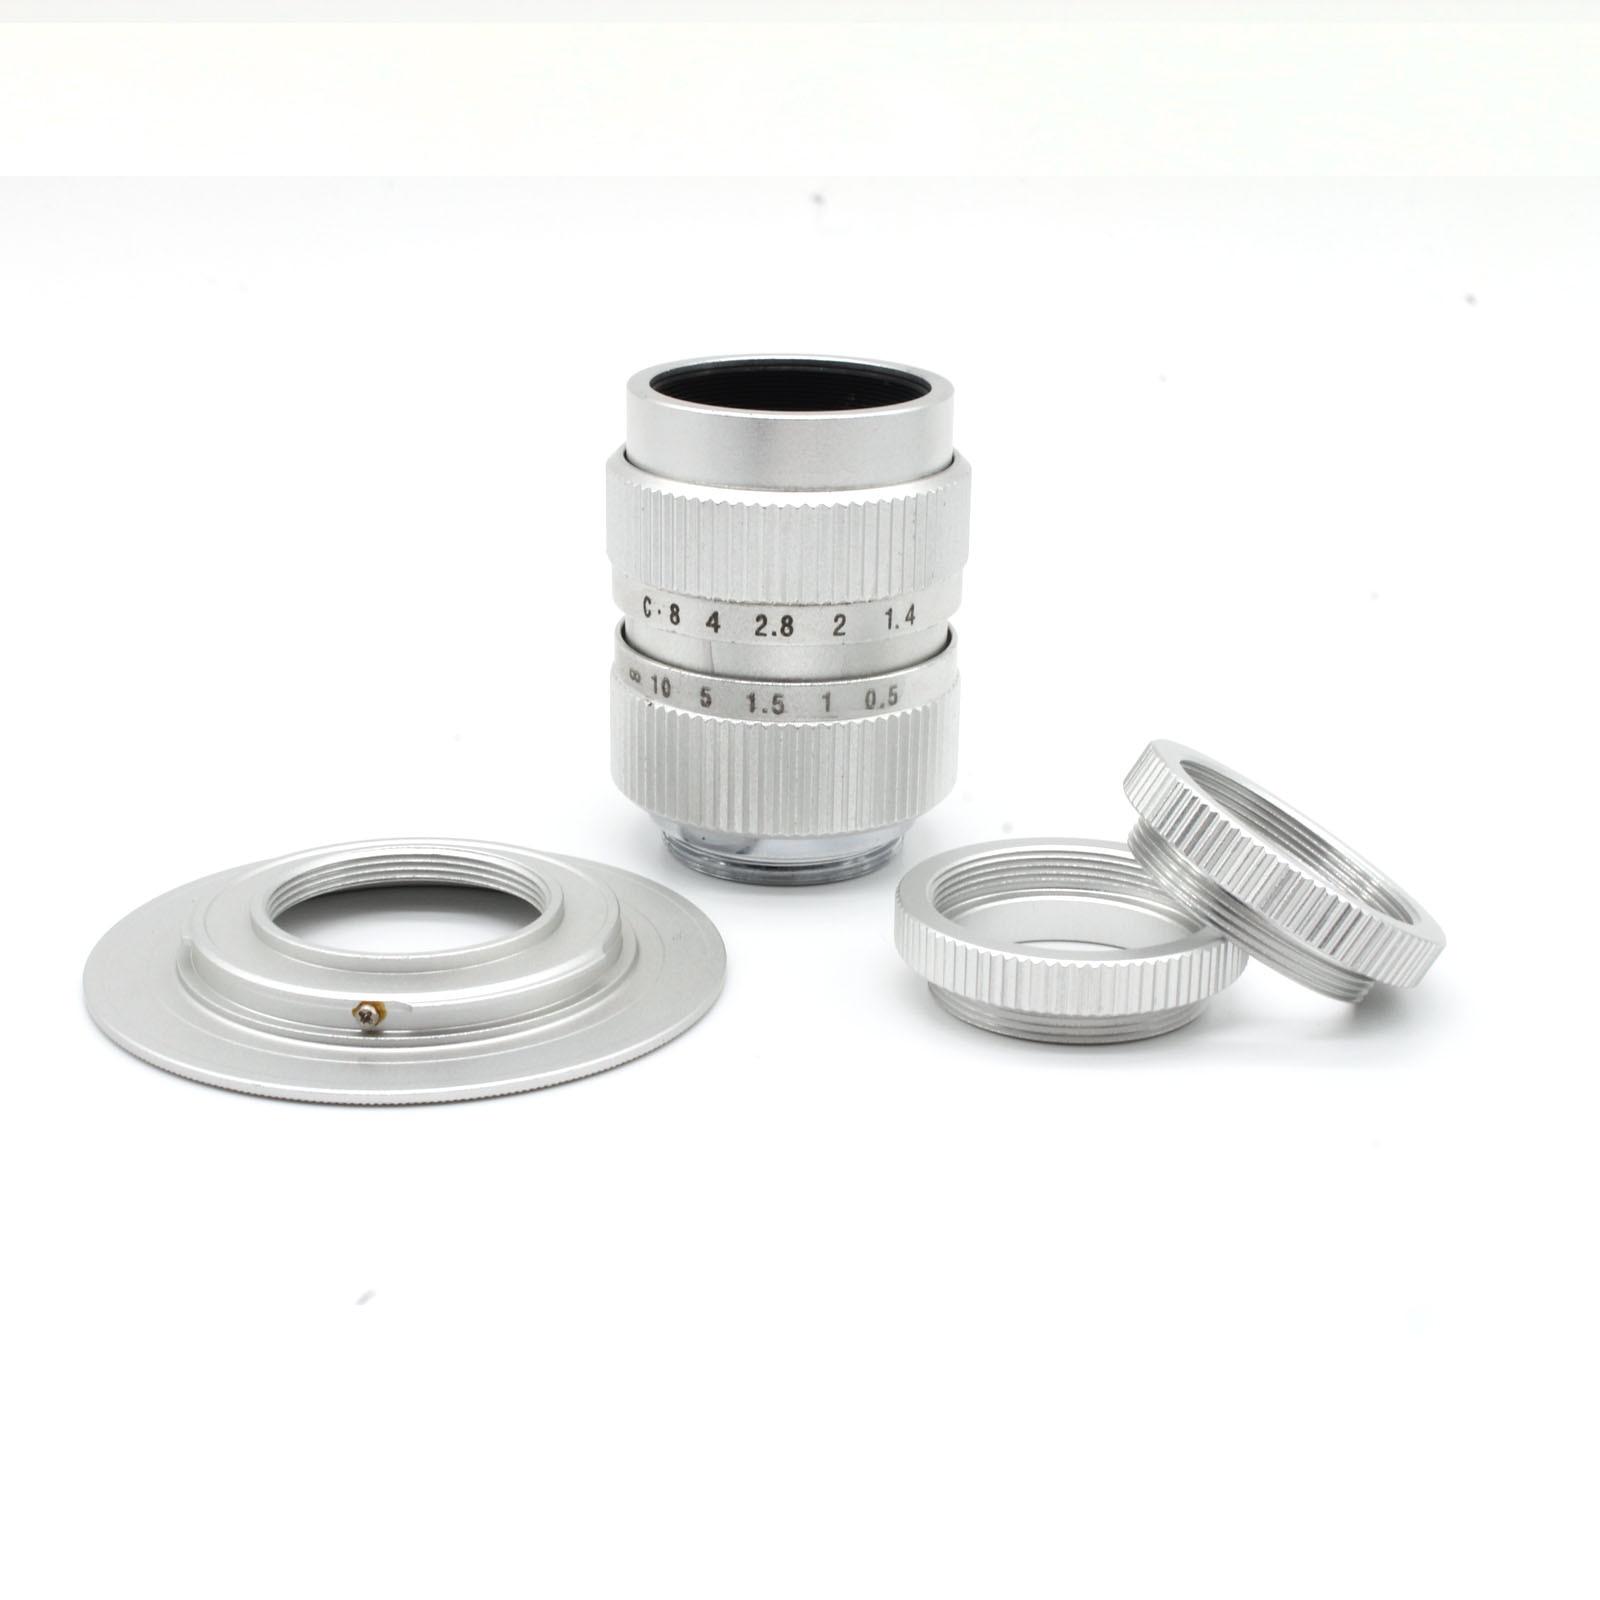 FUJIAN 25mm f/1.4 מיניאטורי SLR עדשת פנסוניק מיקרו 4/3 E-P1 P3 G1 GF5 מאקרו SILVE משלוח חינם